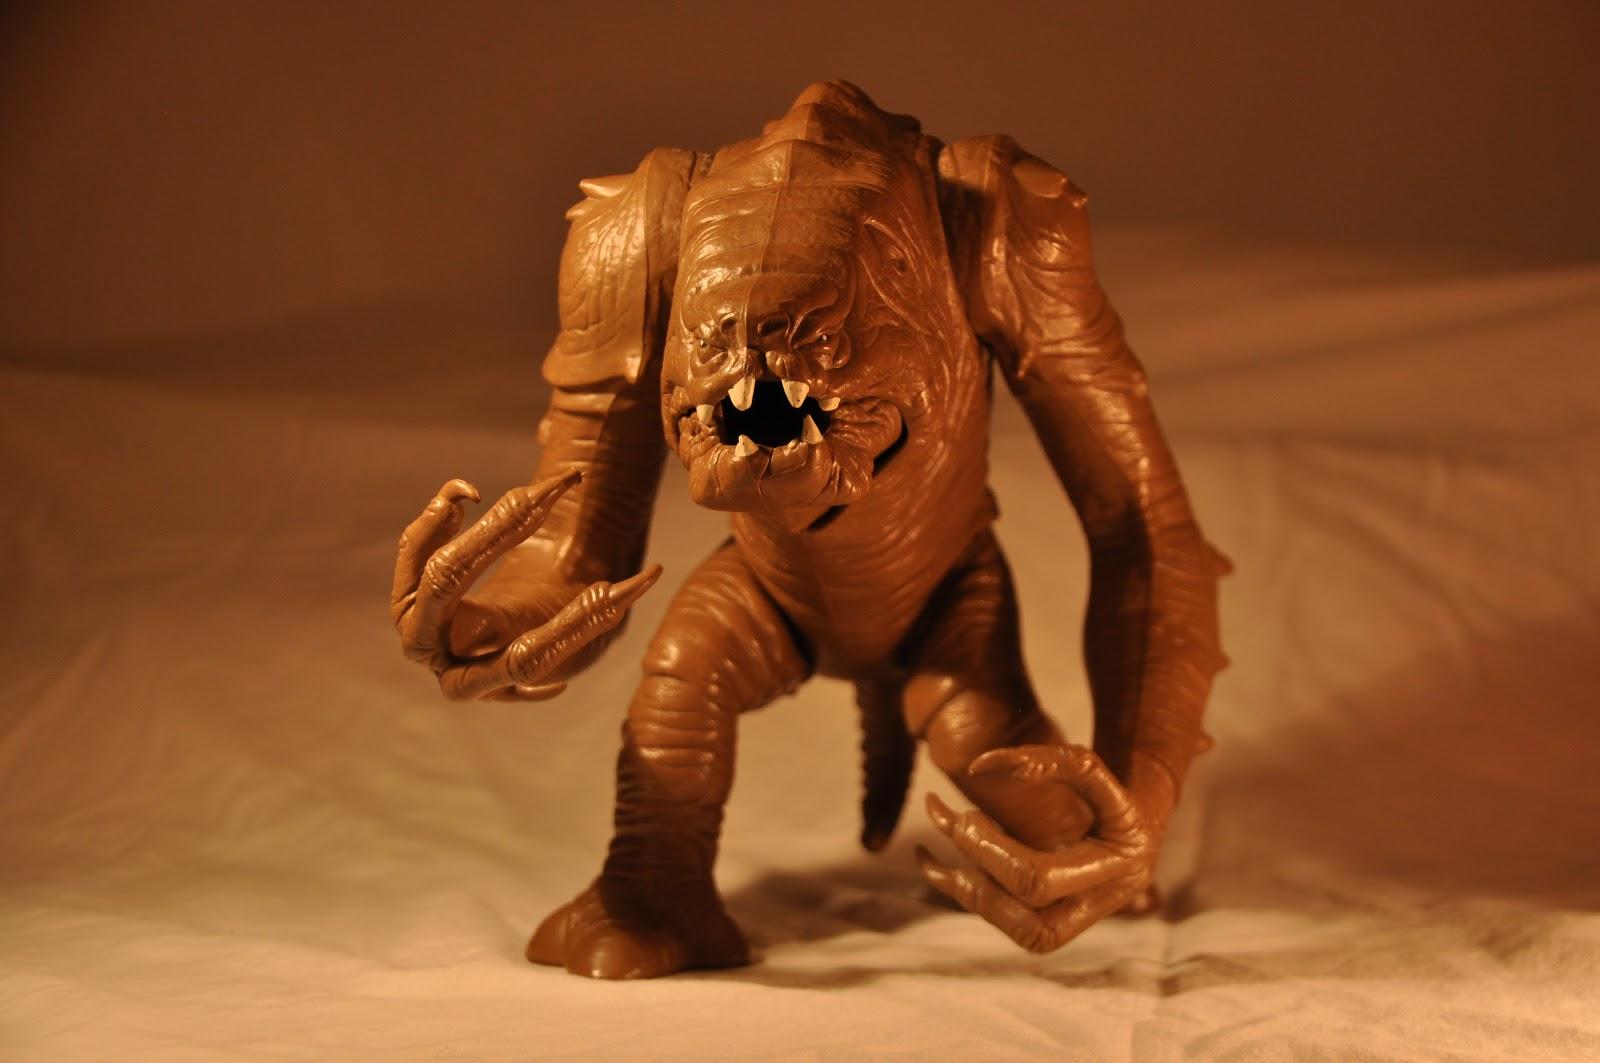 Vintage Star Wars: Rancor | Vintage World Rancor Monster